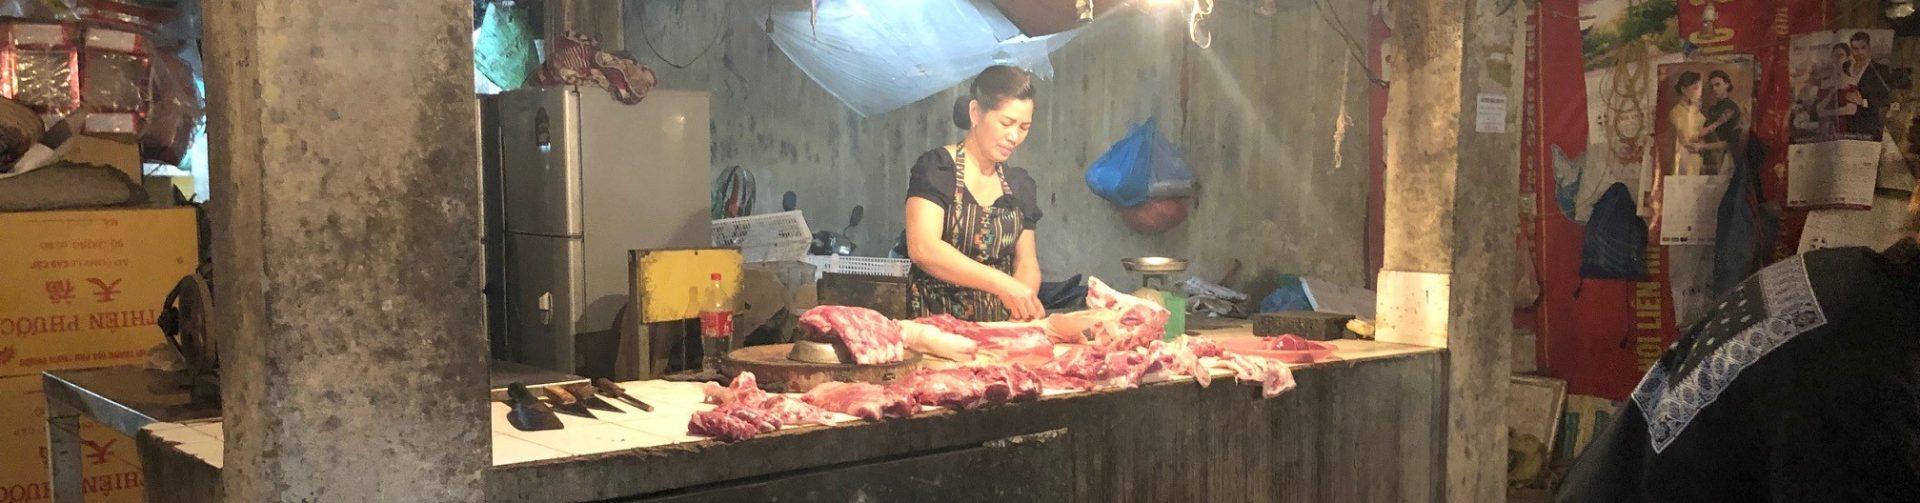 Food System Fact Sheet: Vietnam